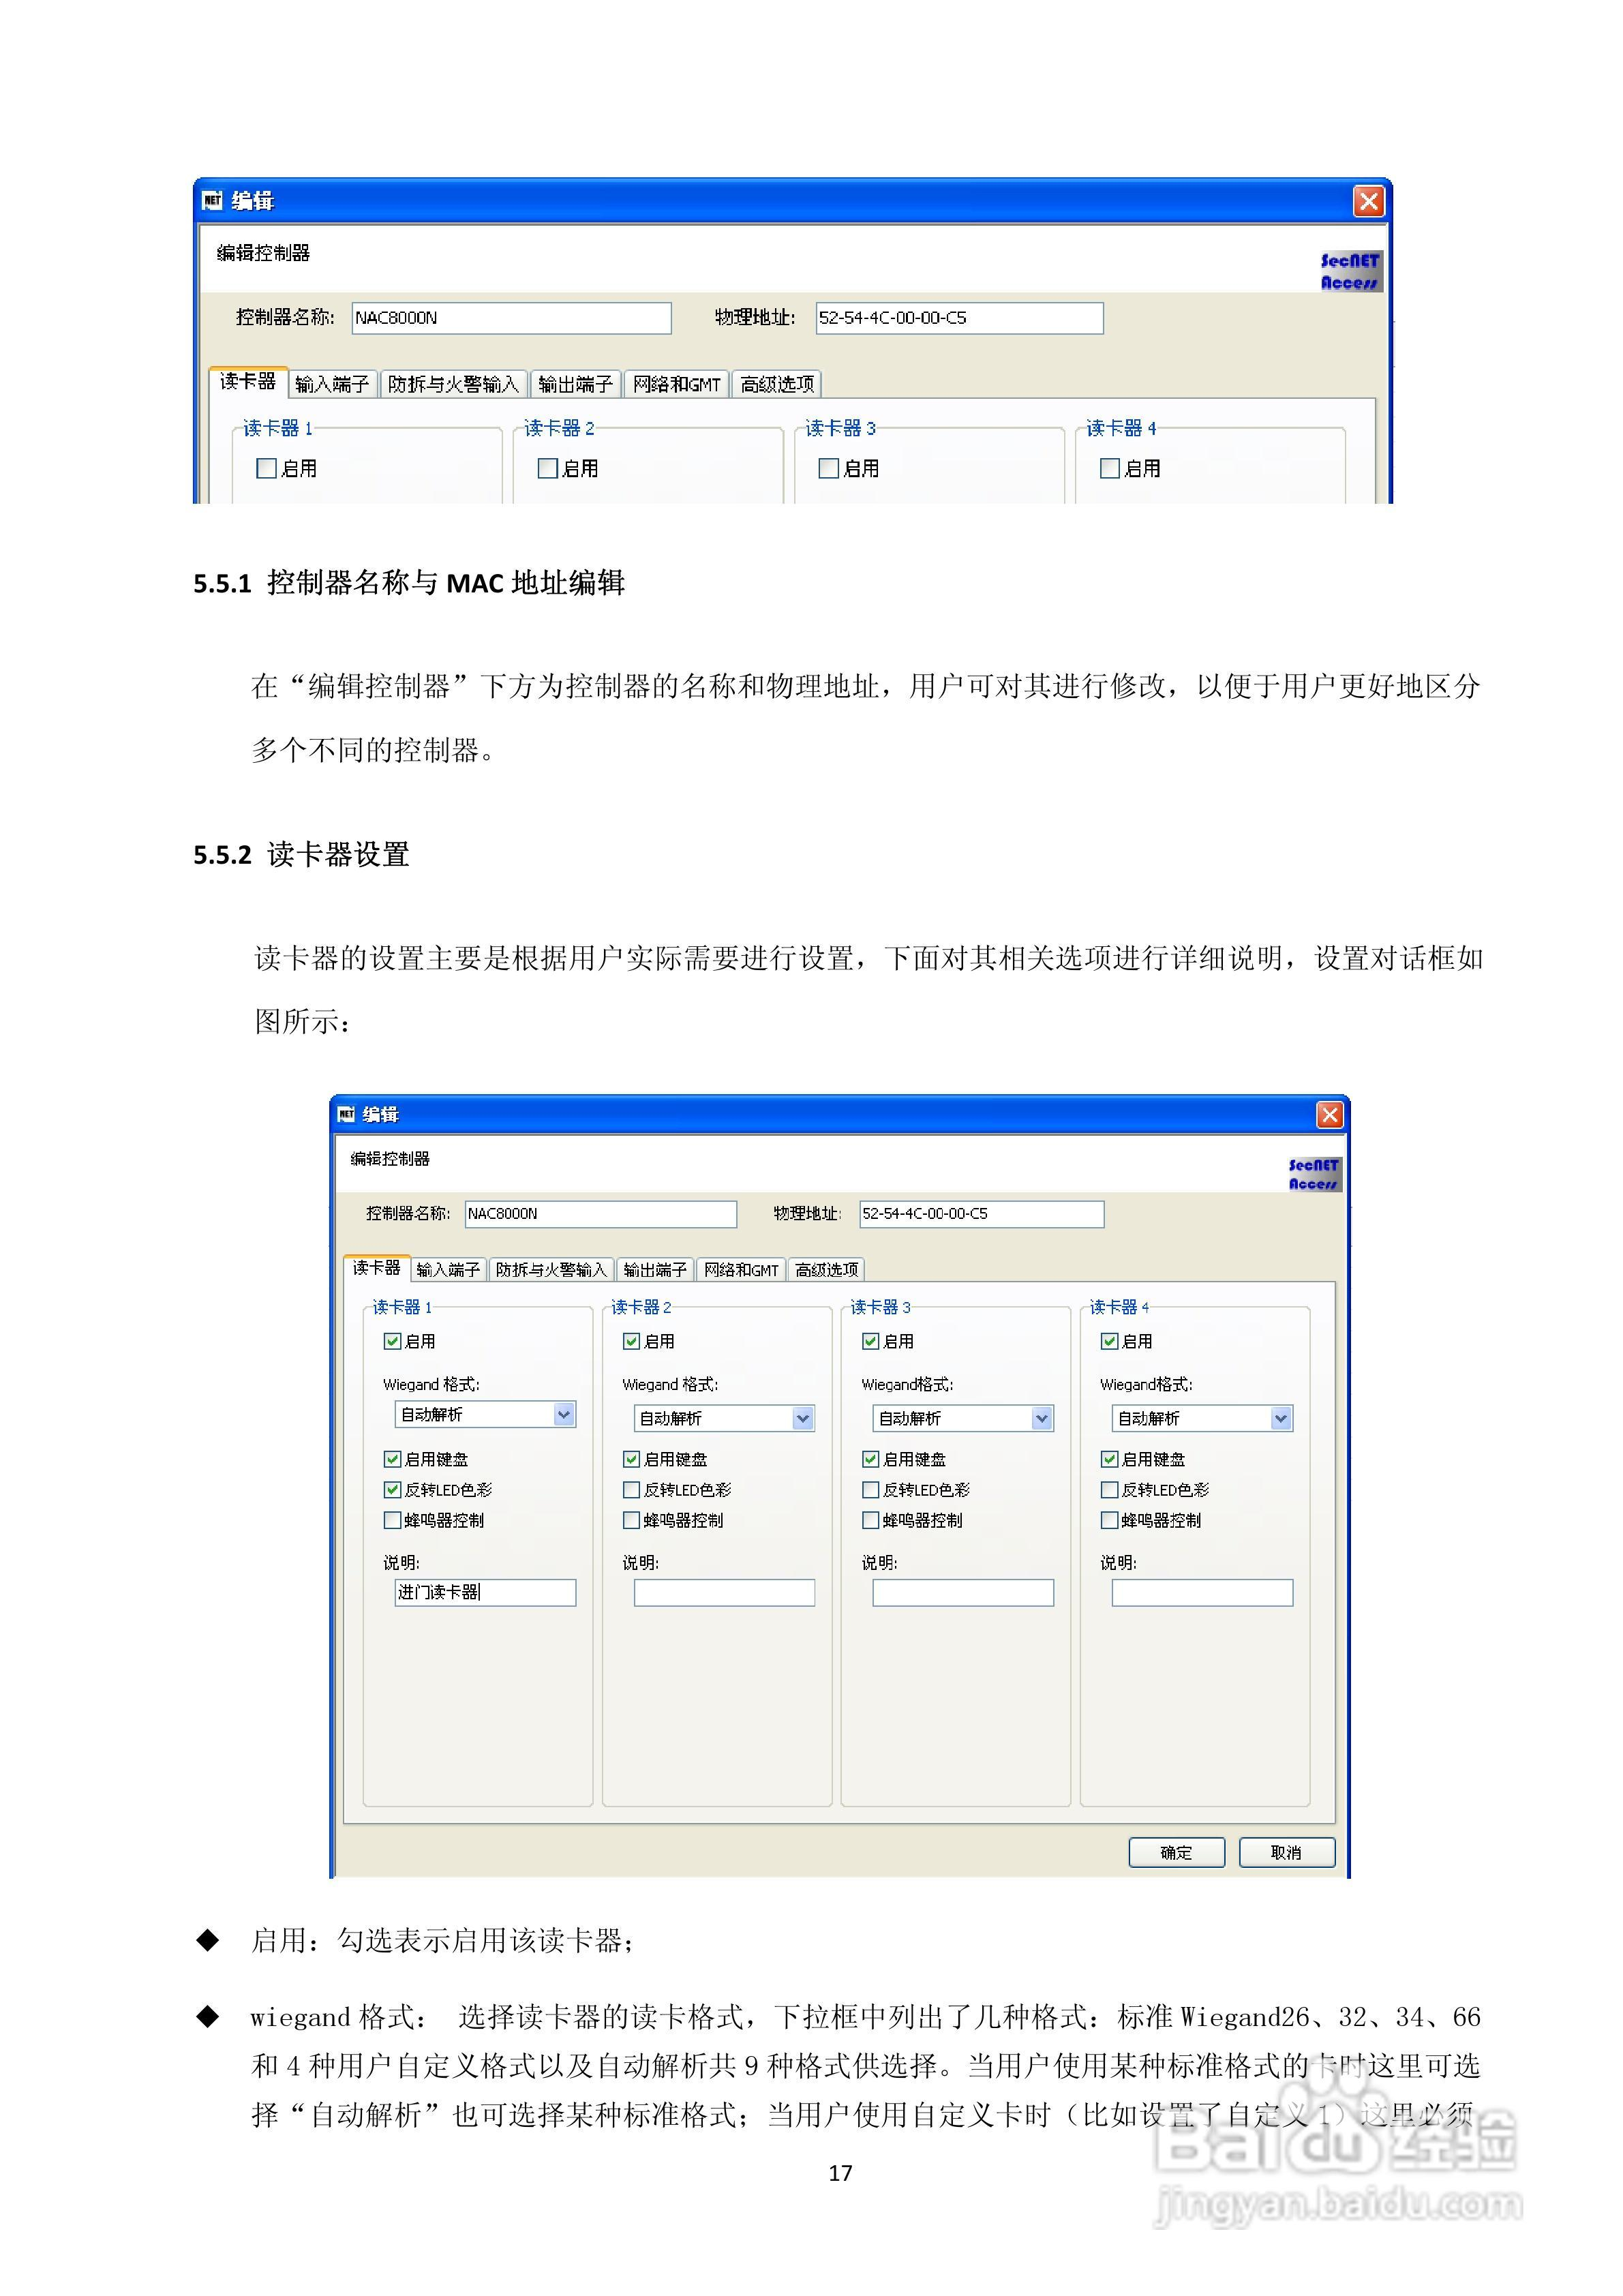 uspsecnet网络门禁管理软件使用说明书:[3